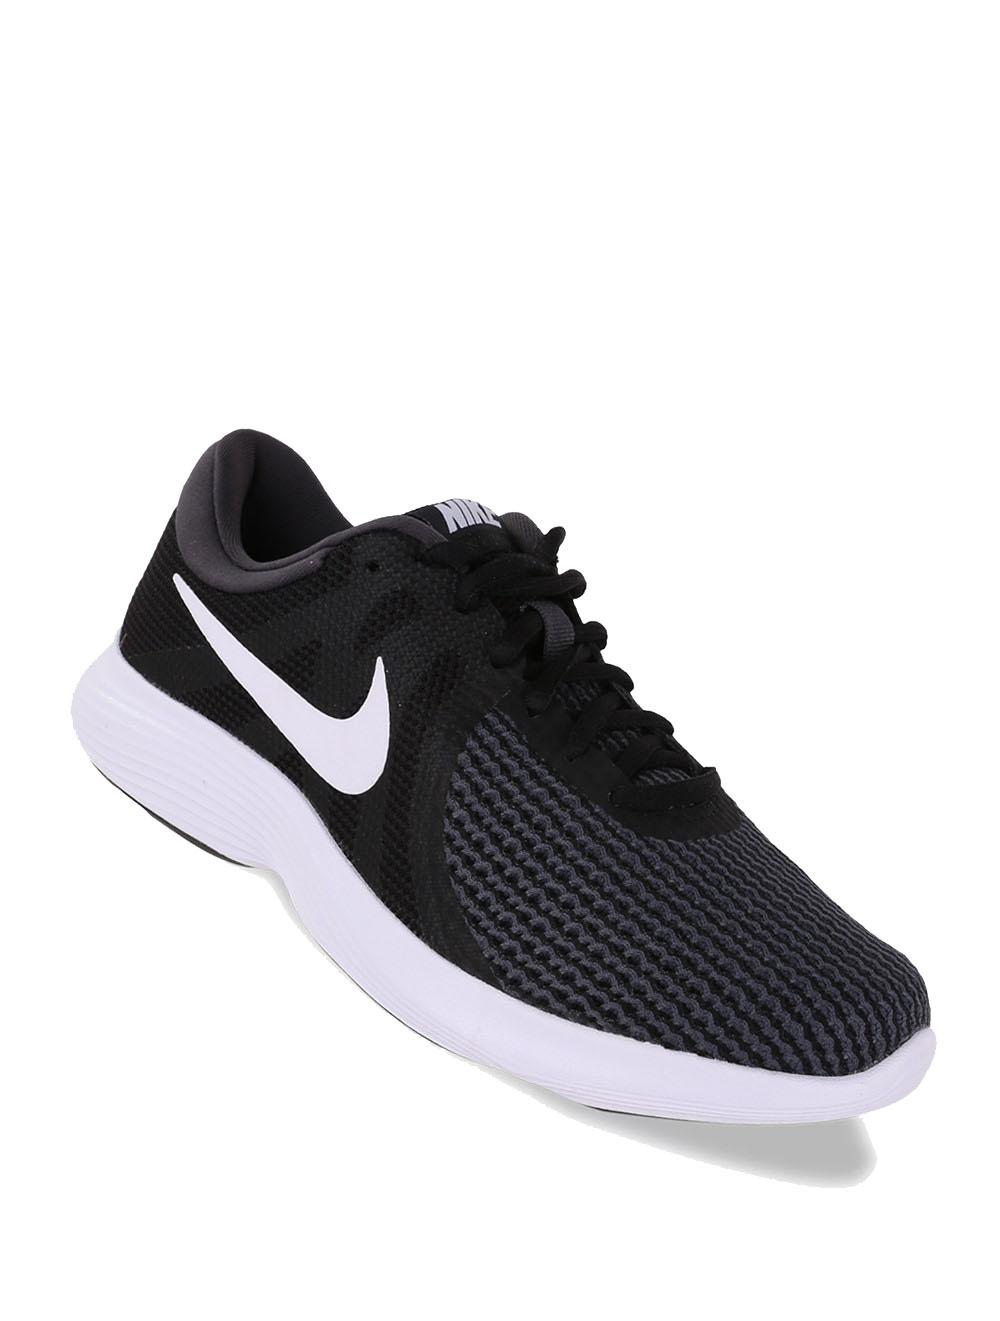 NIKE Revolution 4 - Sepatu Pria - Hitam